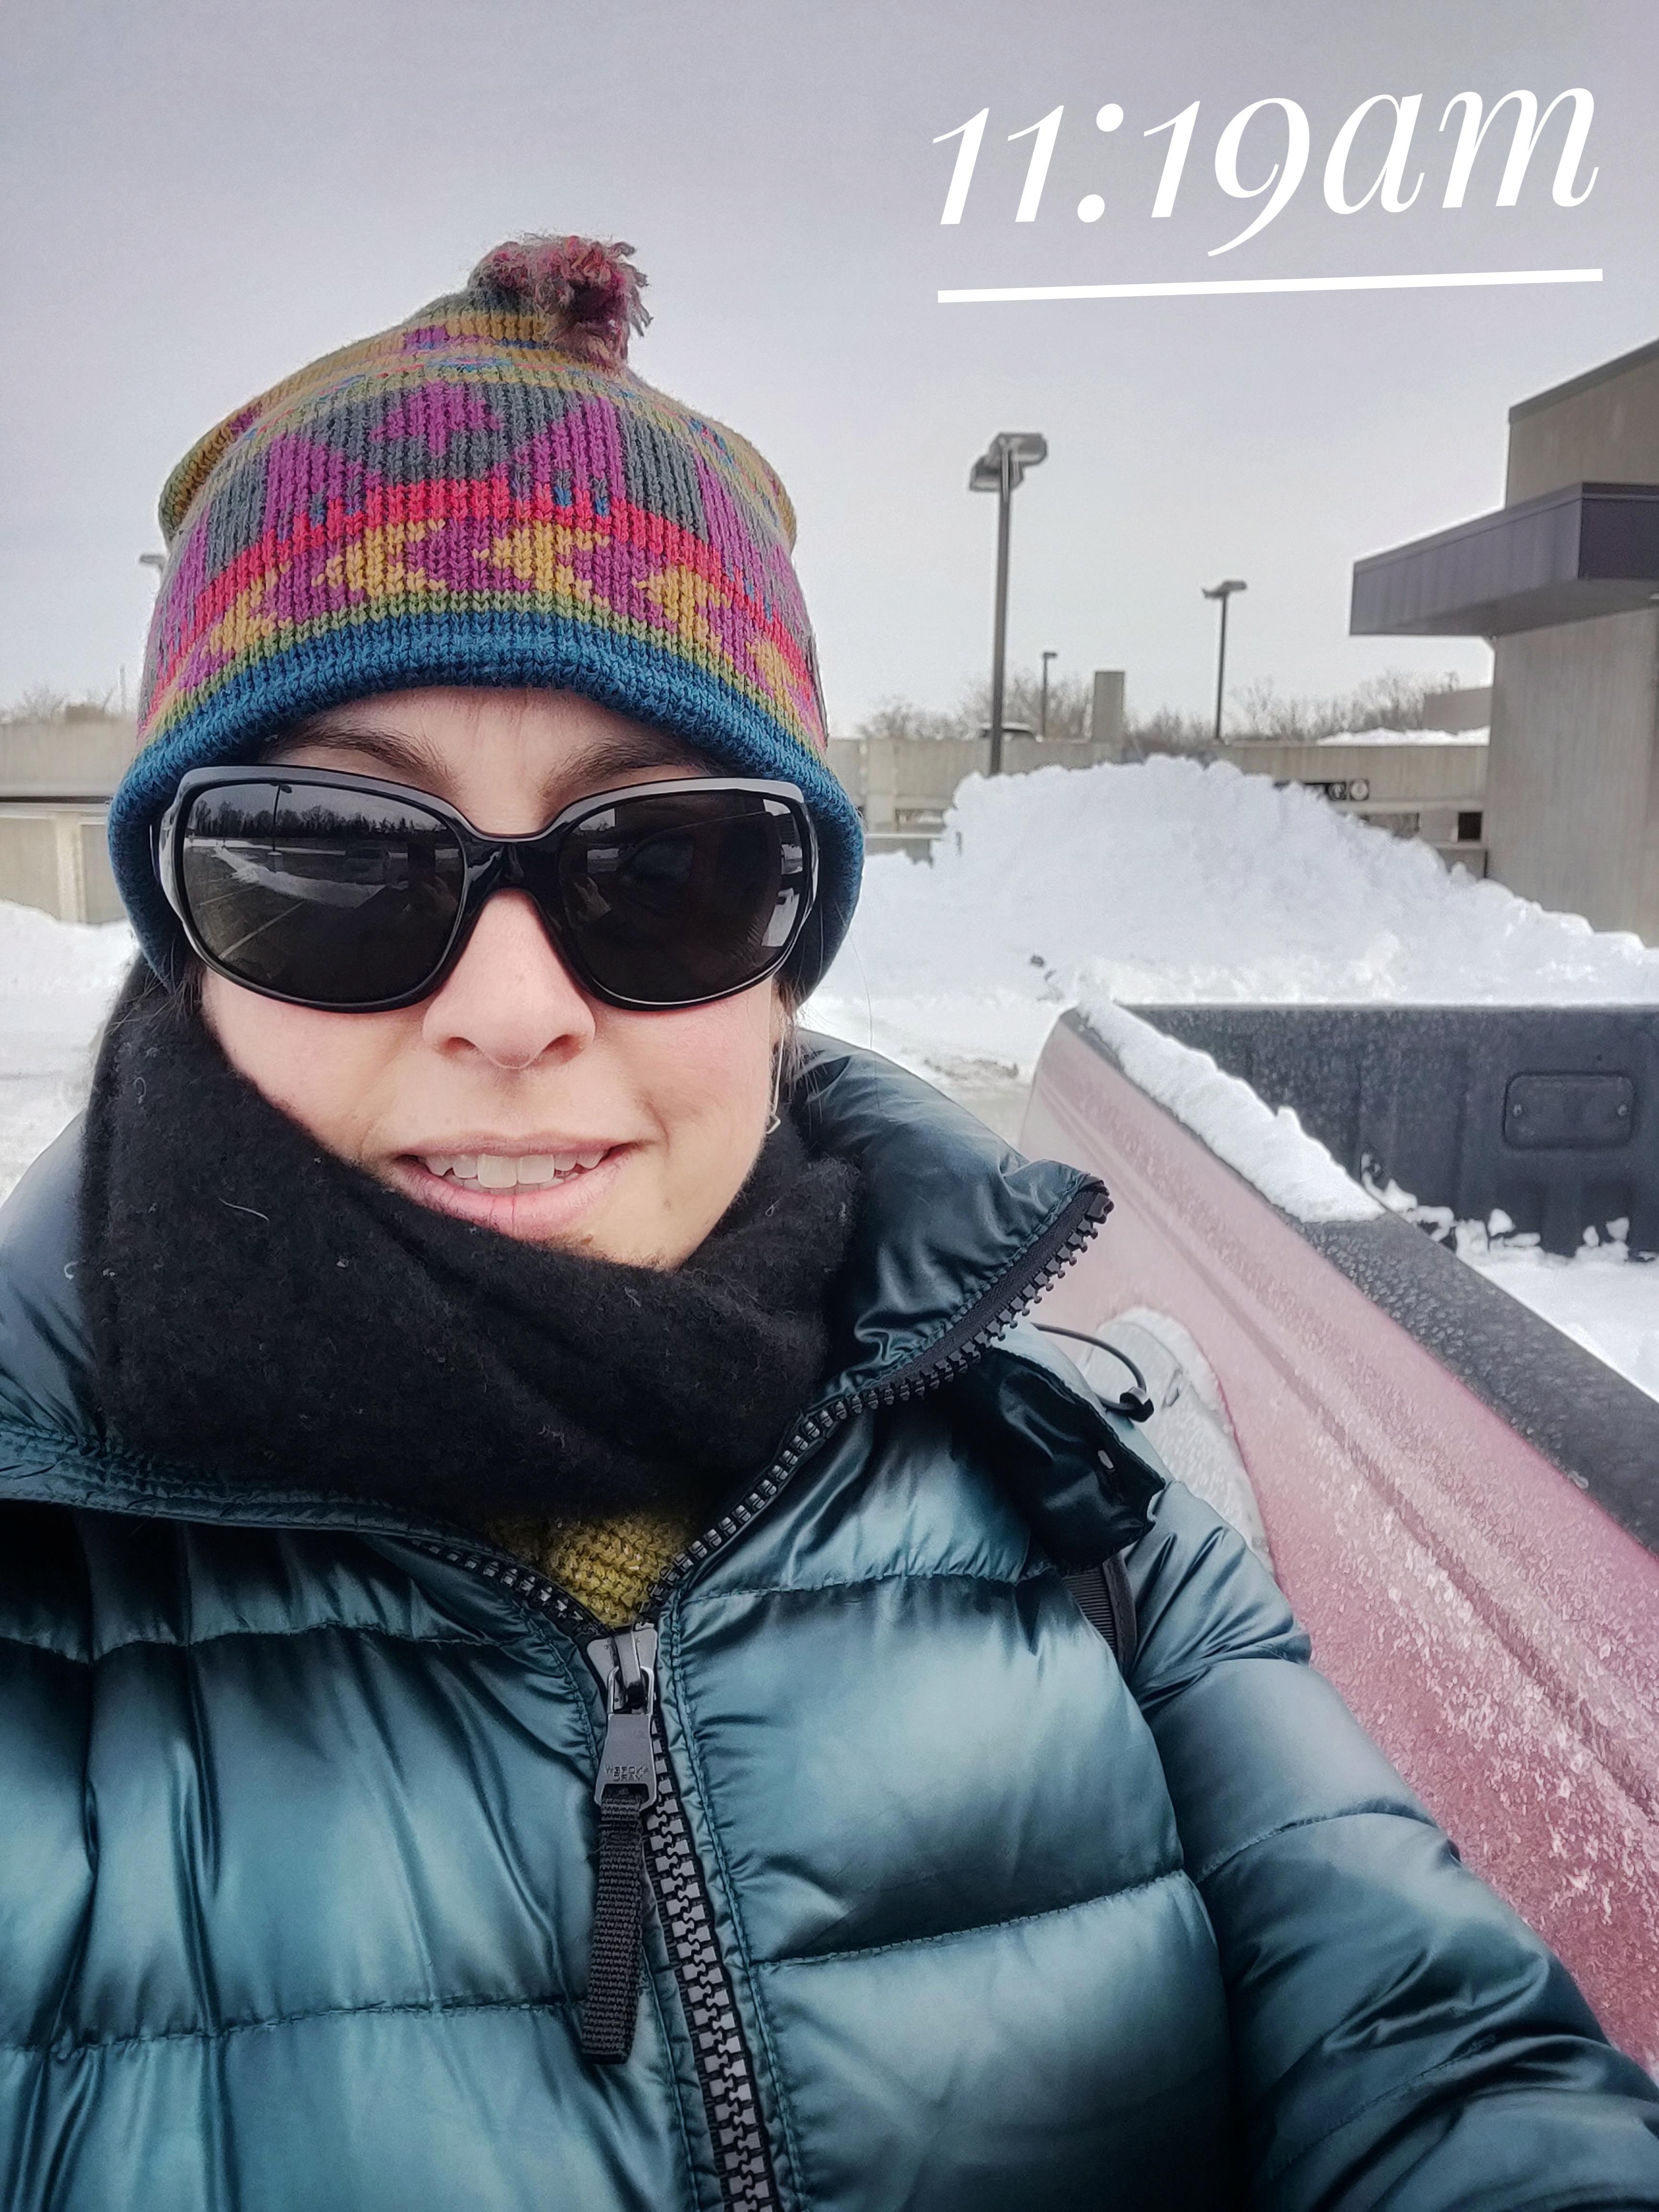 11_19am Snowpocalypse, Sweitzer